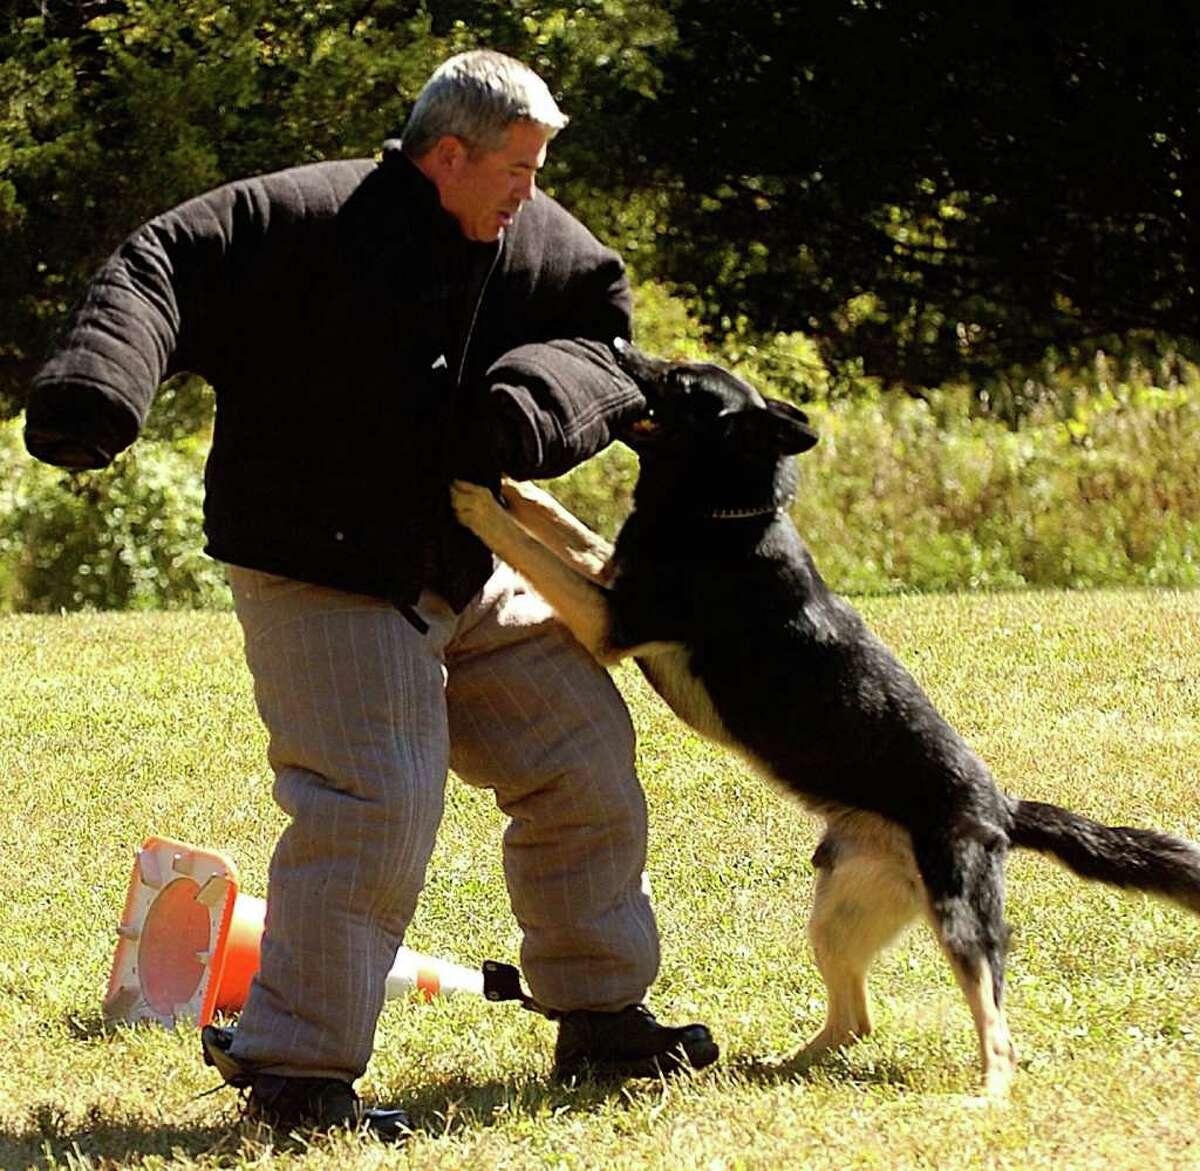 2. Norwalk Police Sgt. Gregg Scully: $201,540